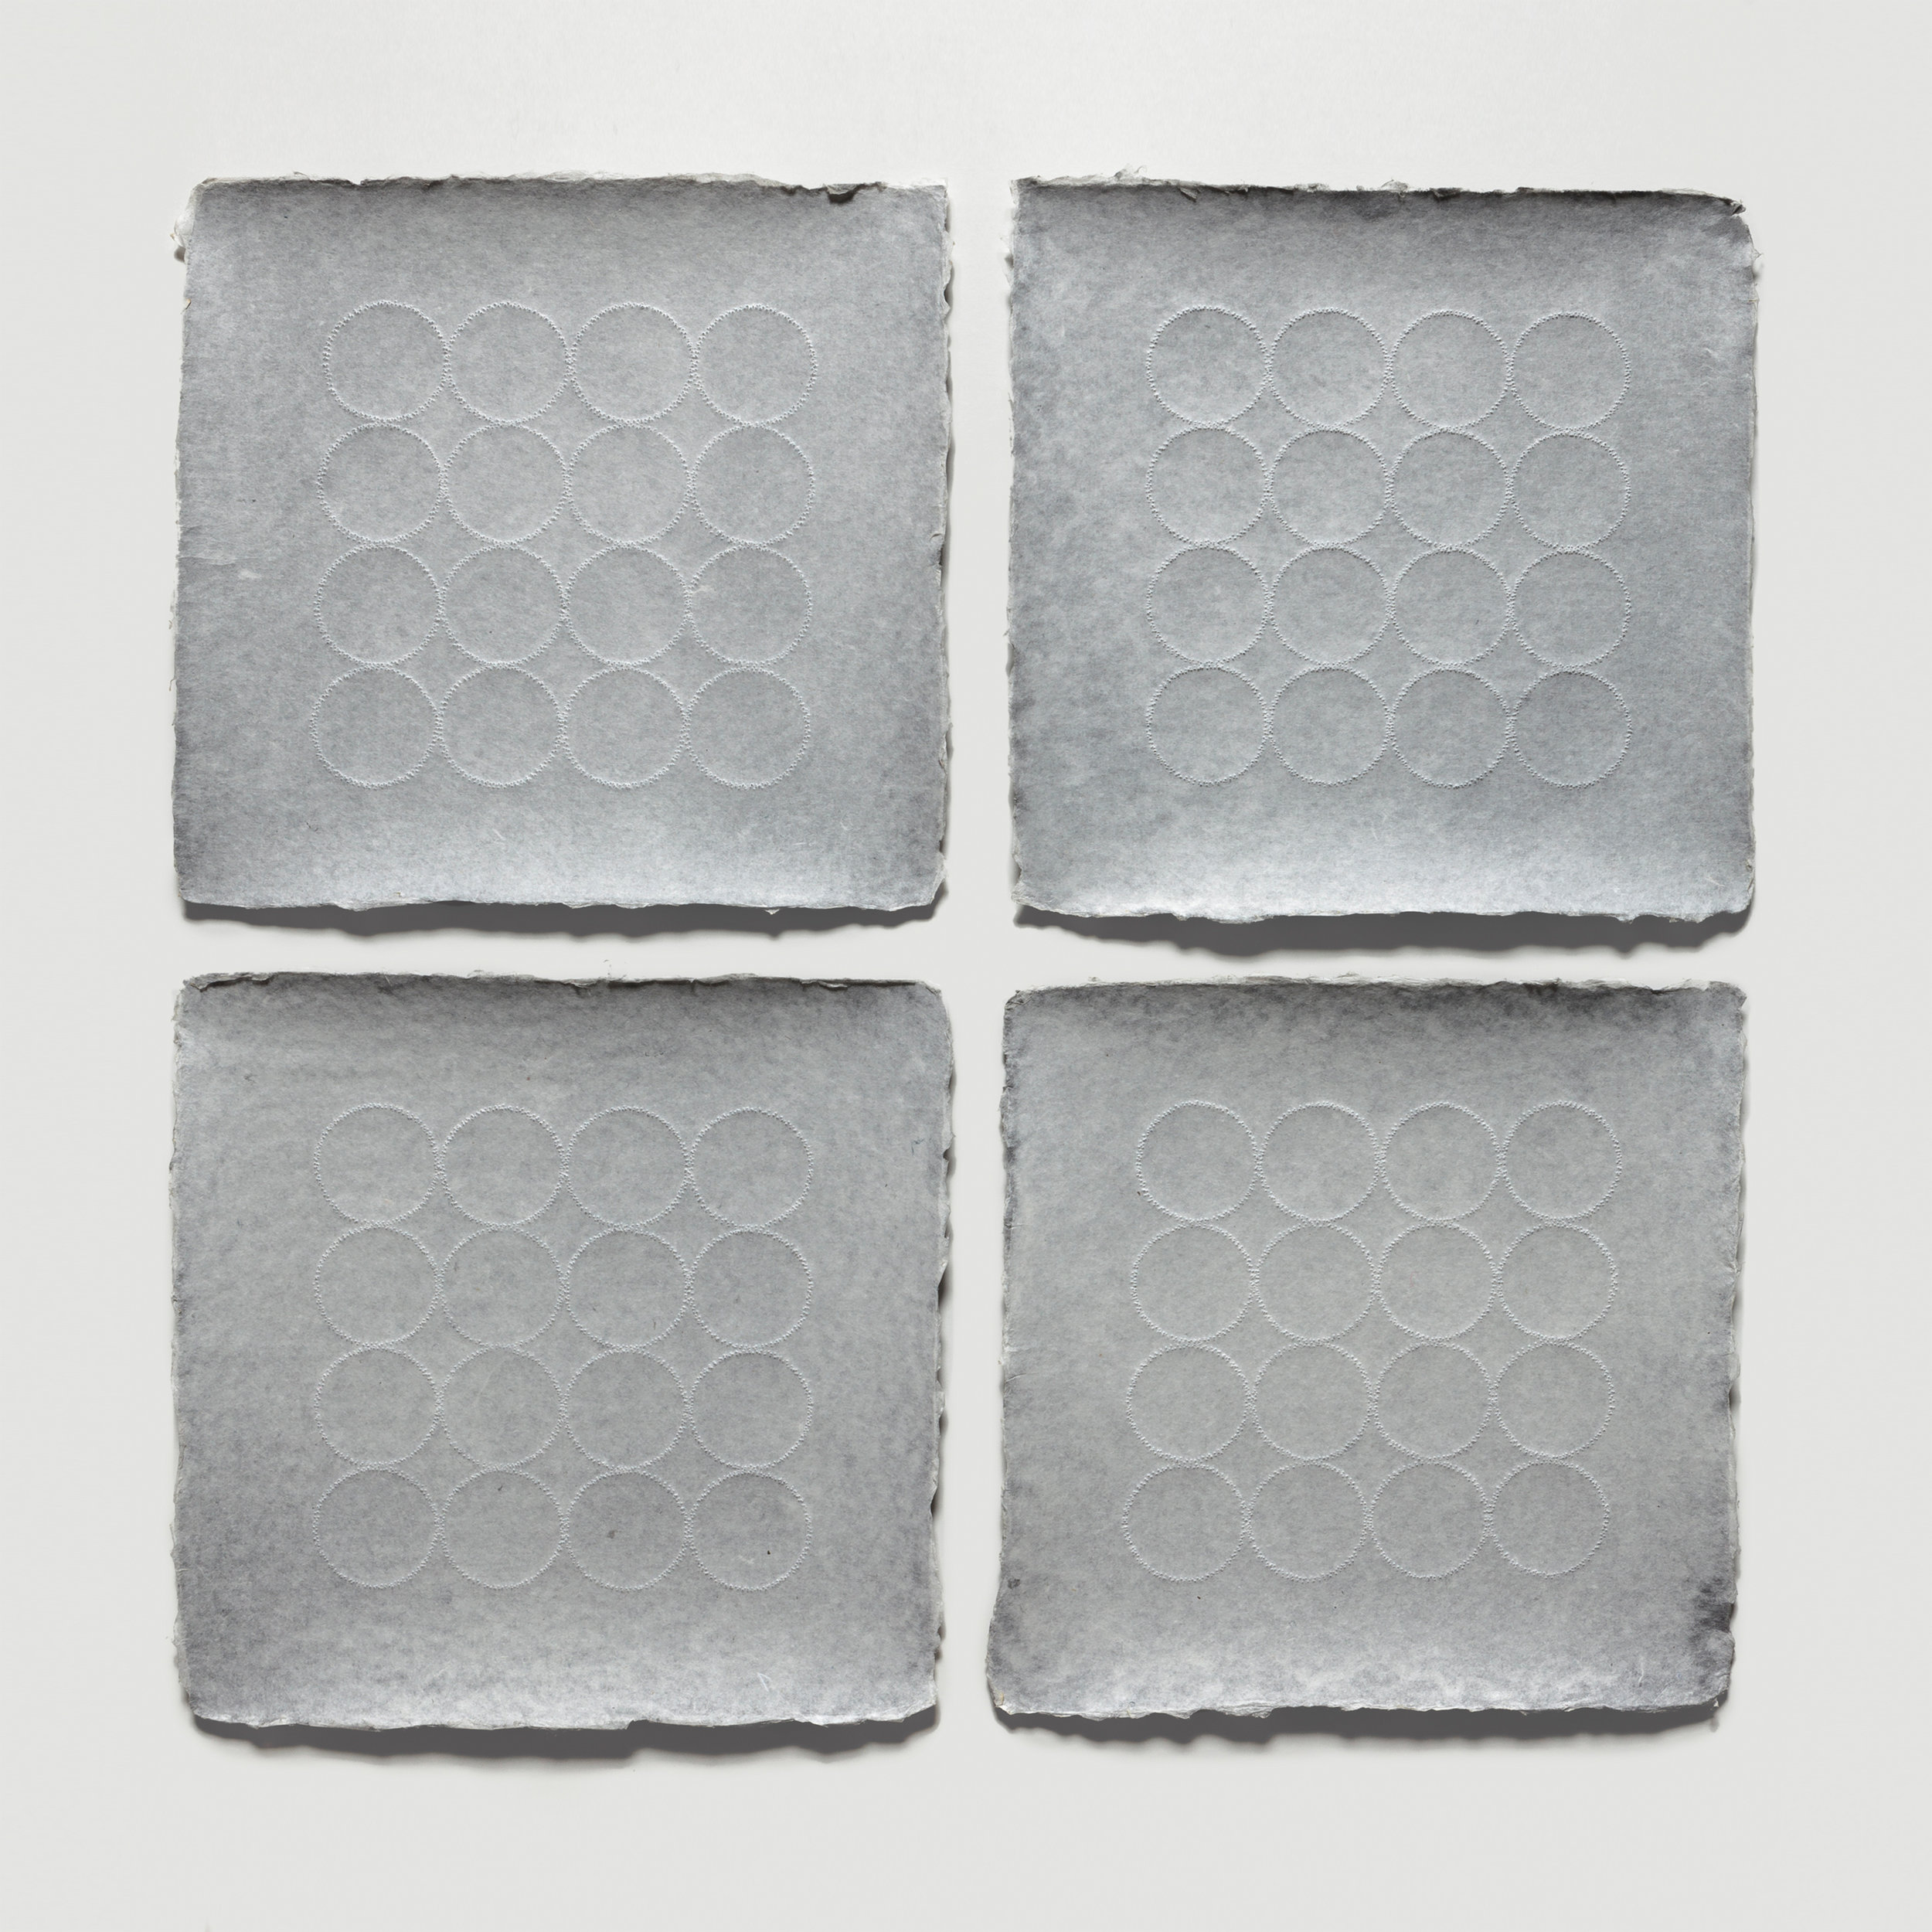 Grid Relief Quadriptych  Pinpricks on handmade paper - unframed 19 x 19 inches 48.26 x 48.26 cm 2018